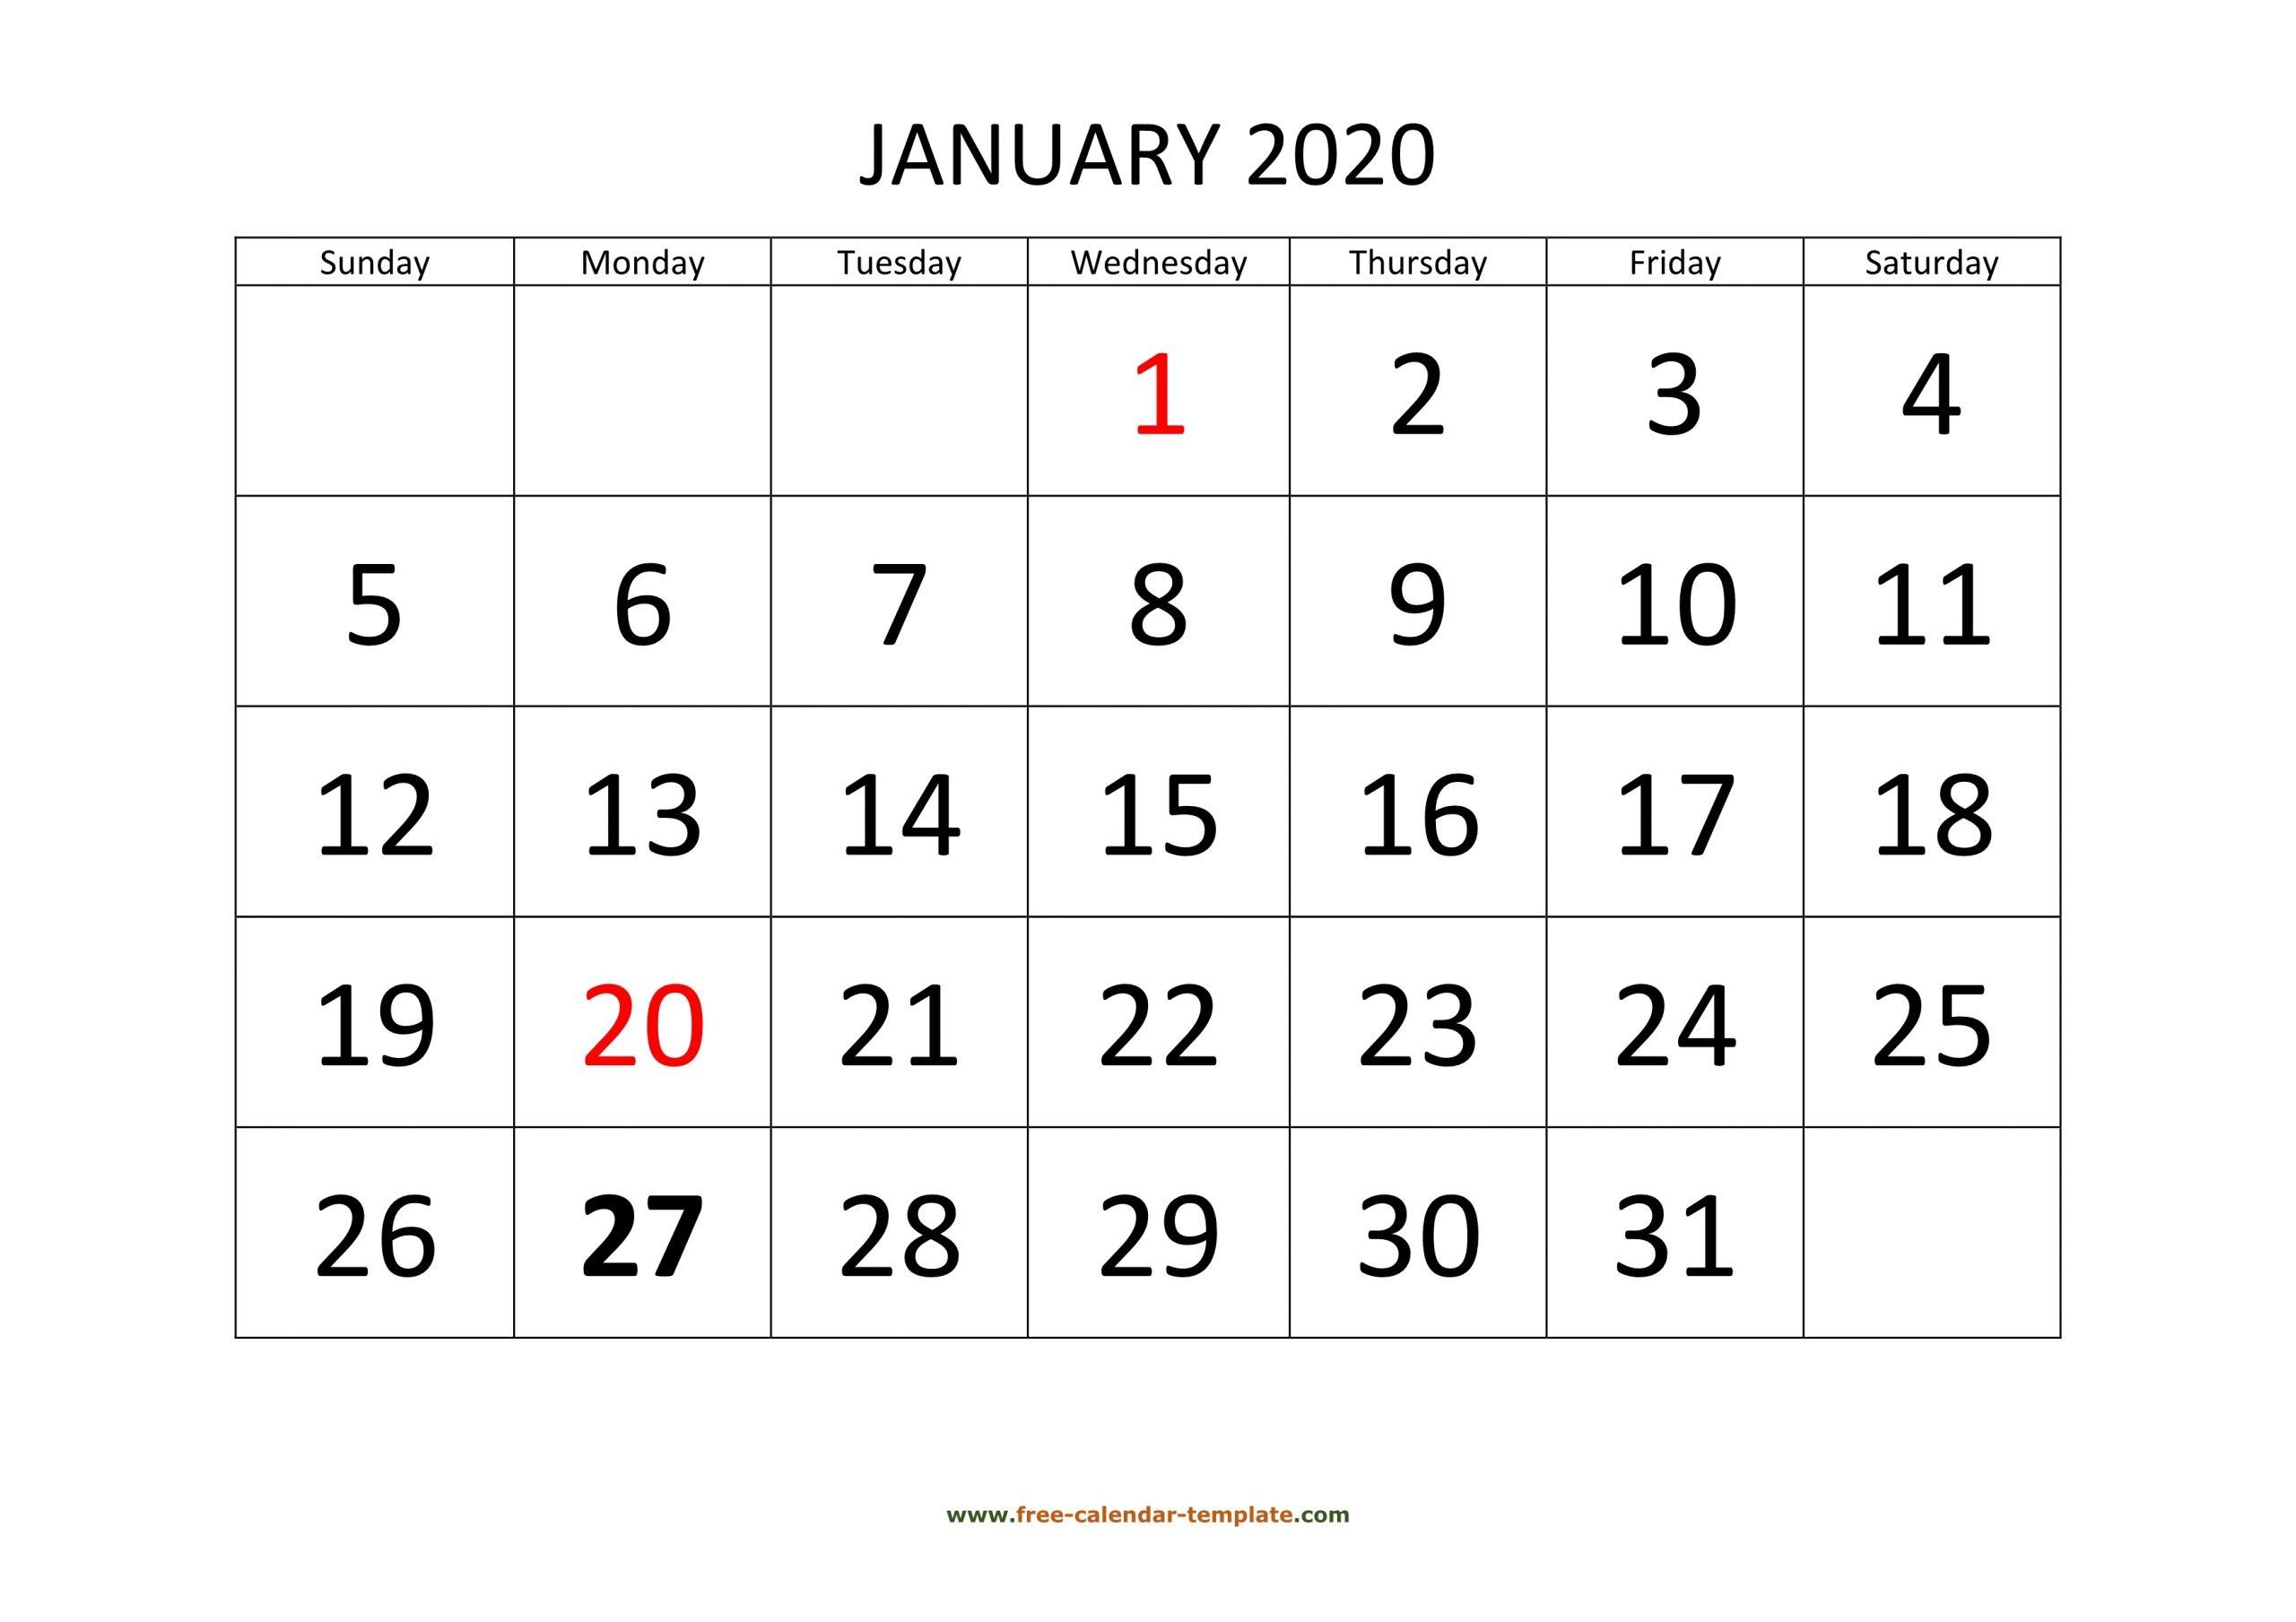 January 2020 Free Calendar Tempplate | Free-Calendar within Free Printable 2020 Calendars Large Numbers